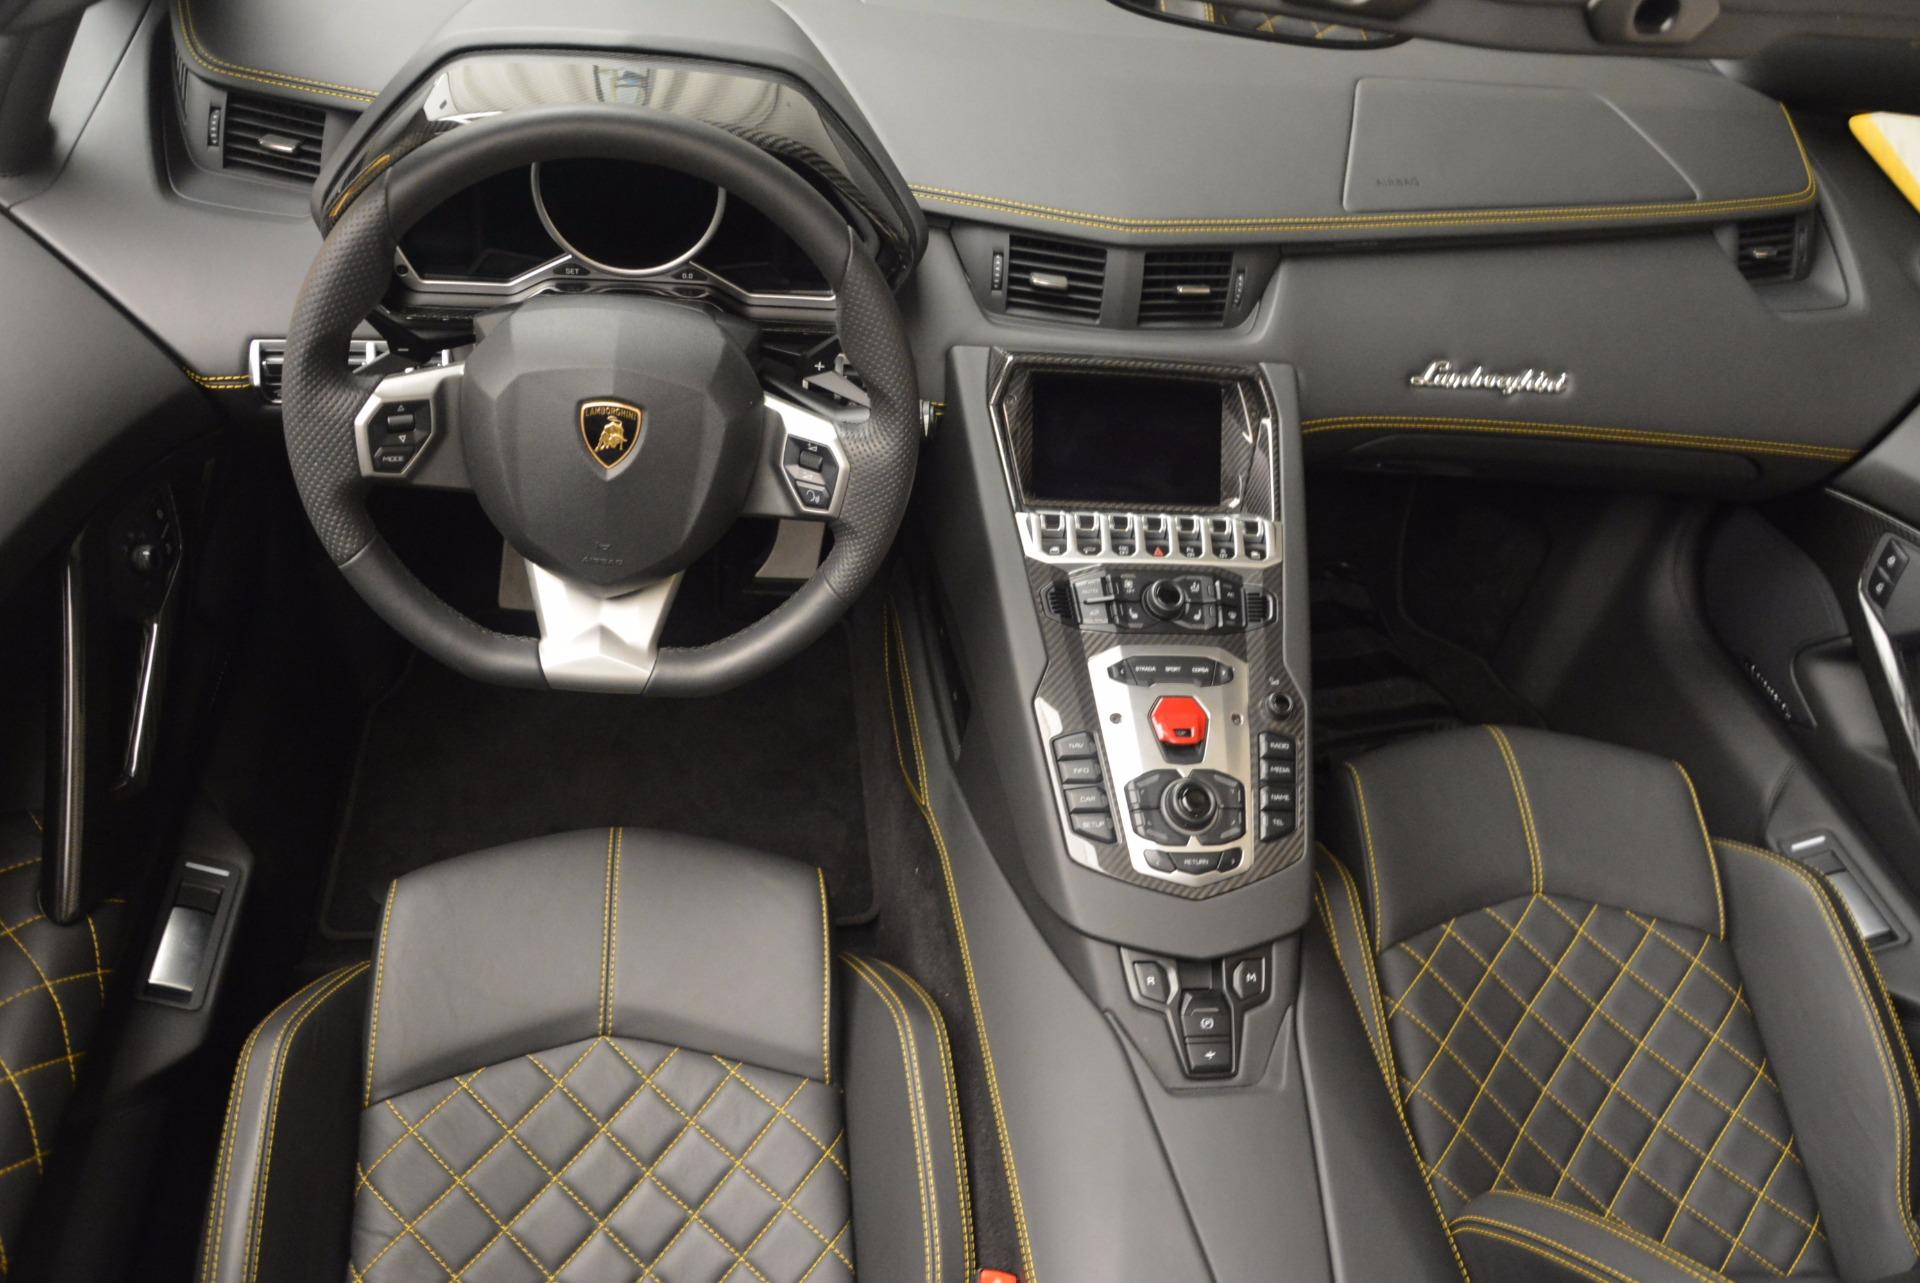 Used 2015 Lamborghini Aventador LP 700-4 Roadster | Greenwich, CT